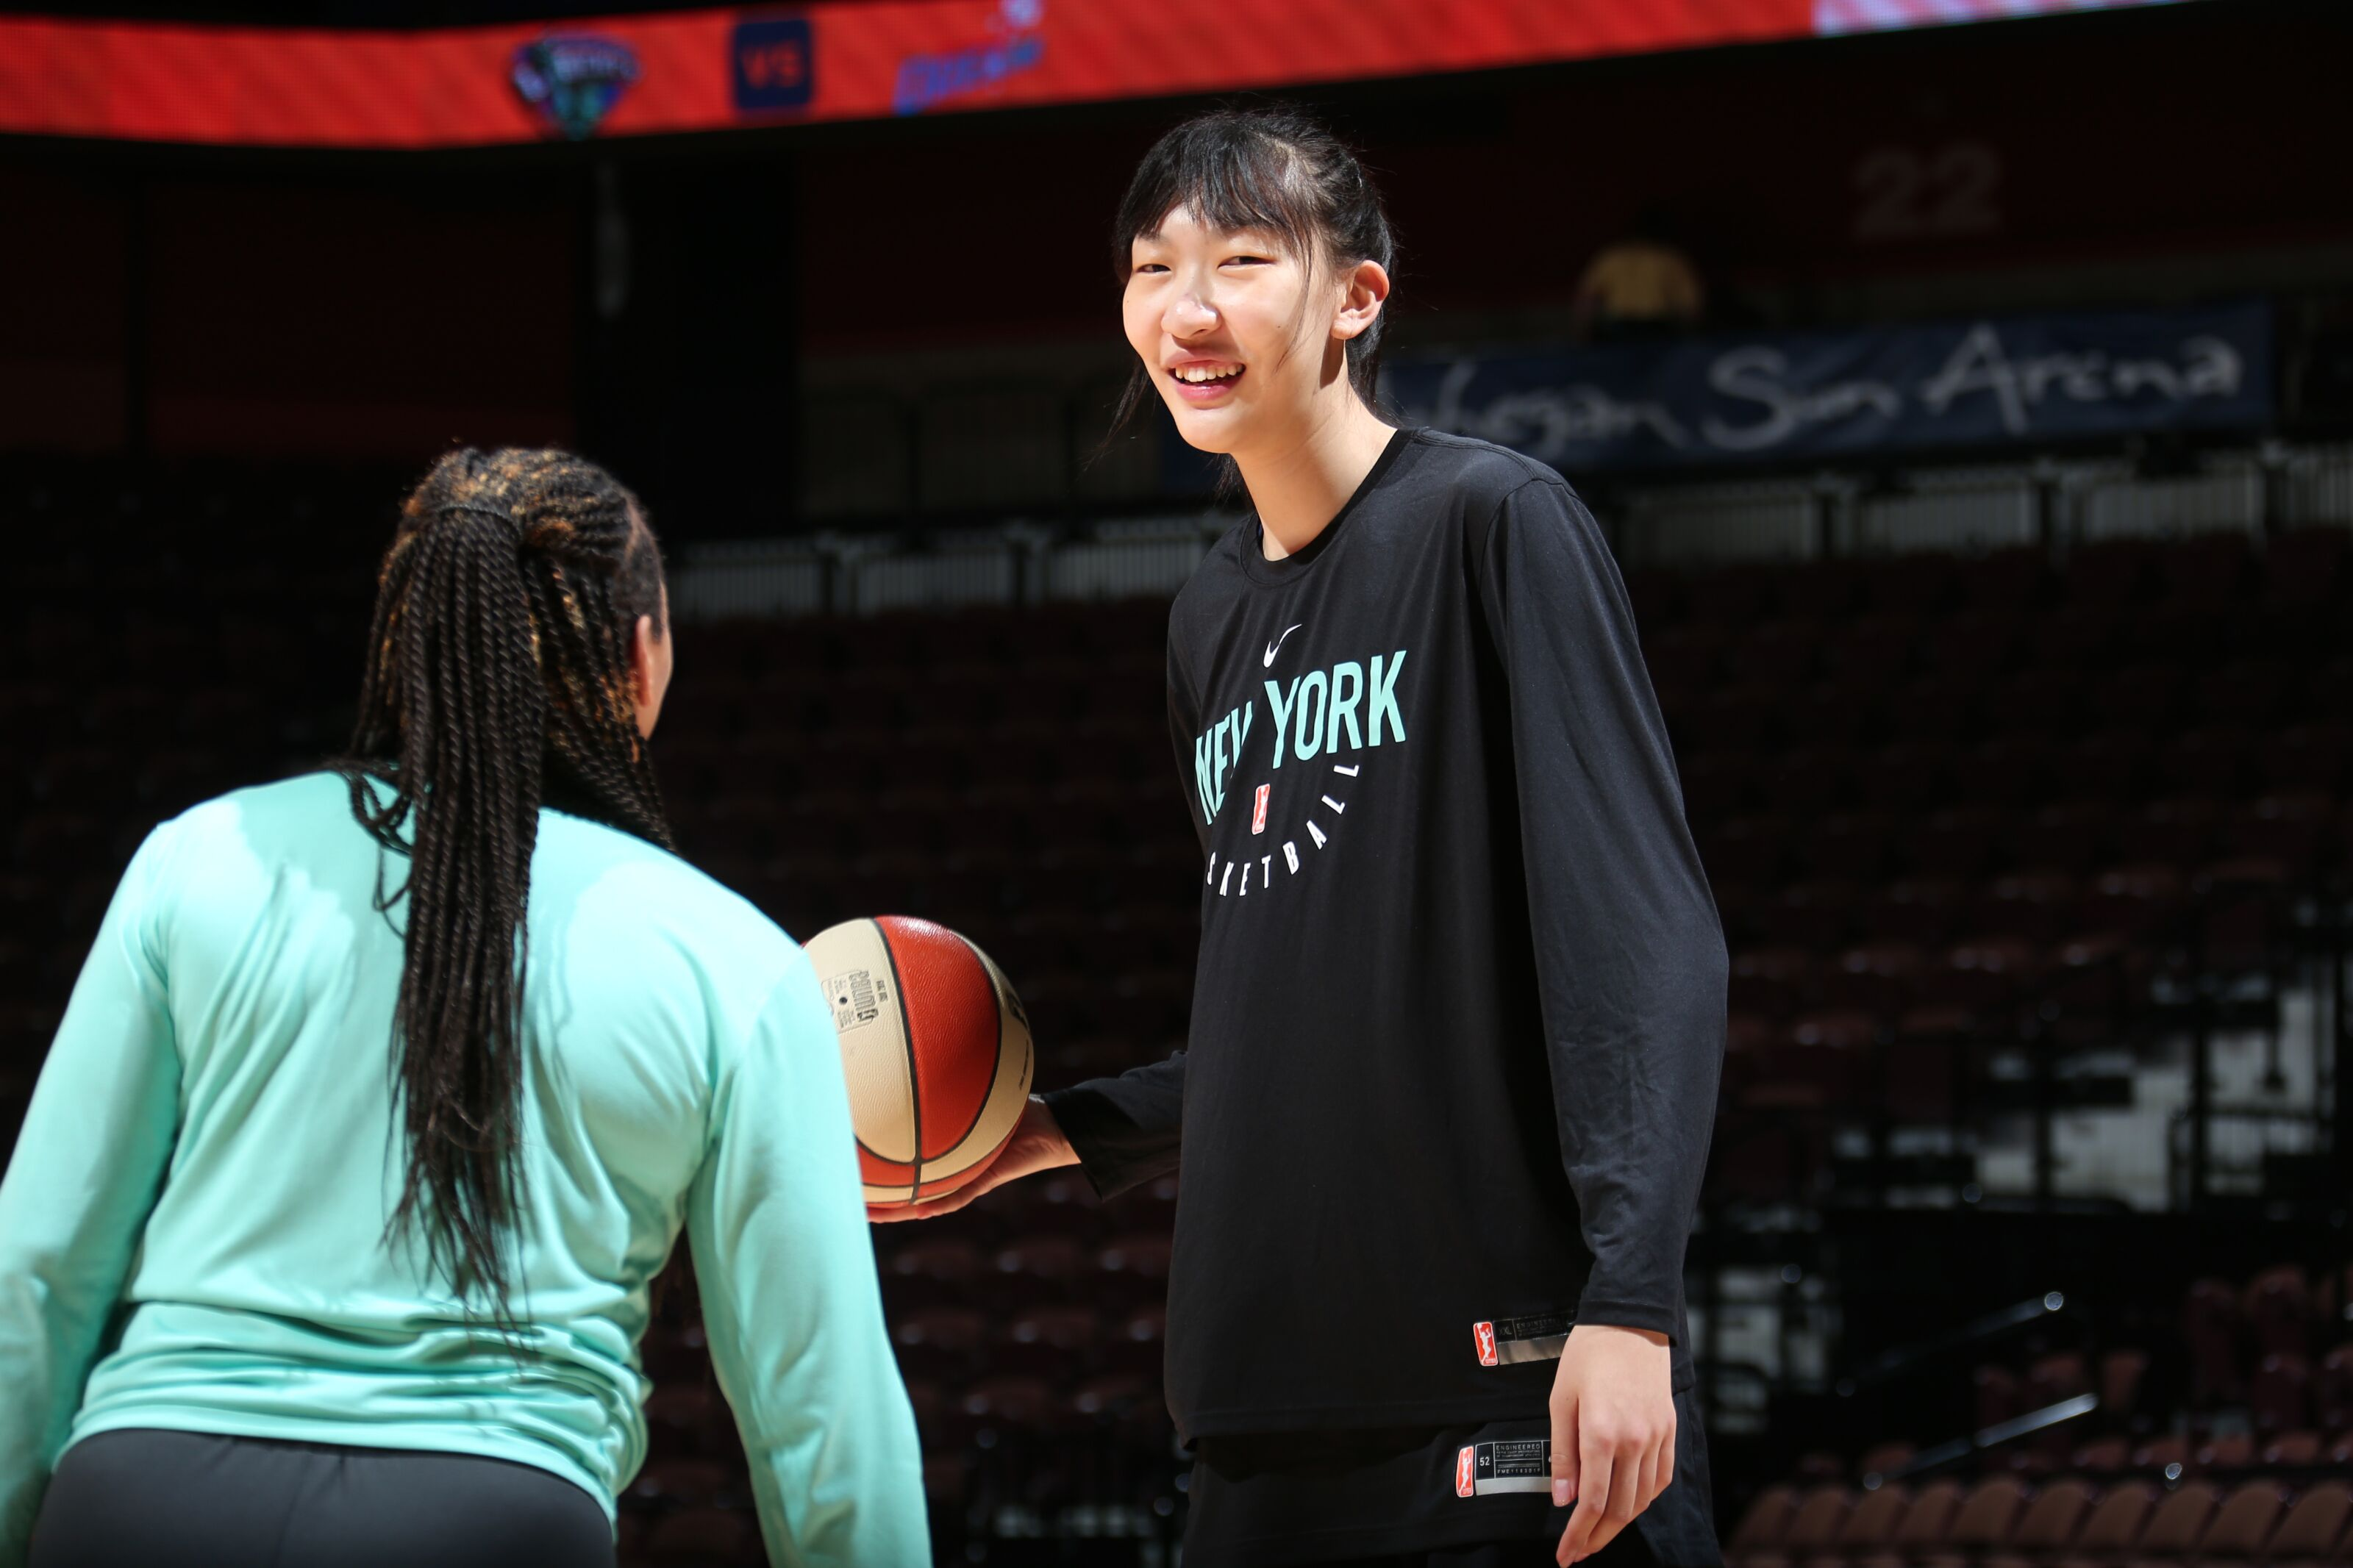 WNBA Season Preview 2019: For the Liberty, development today, wins tomorrow